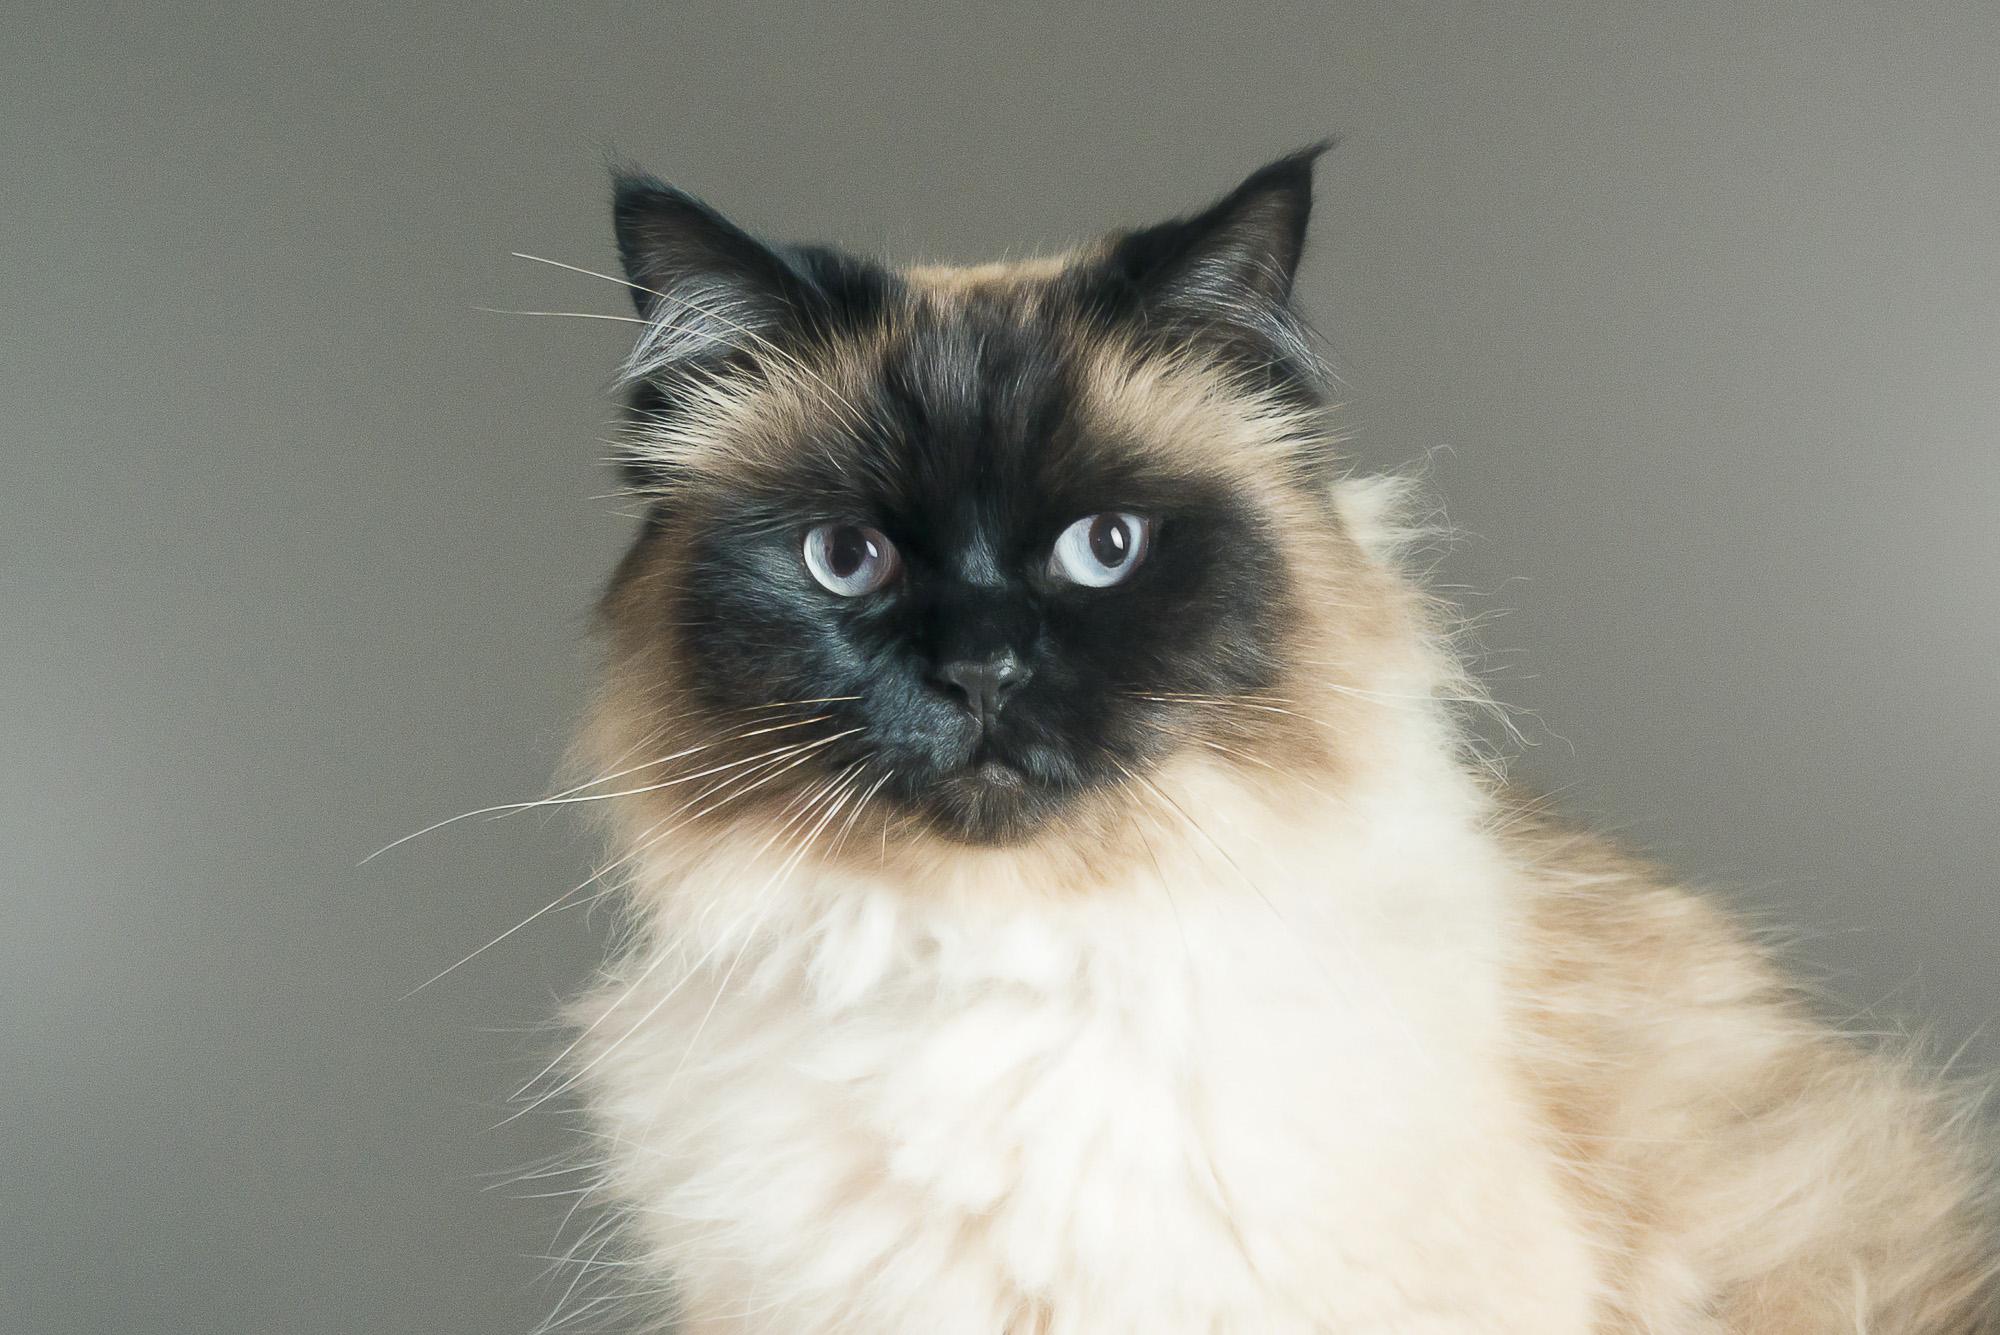 LupinBay-Cat-Photography-0134-3348.jpg